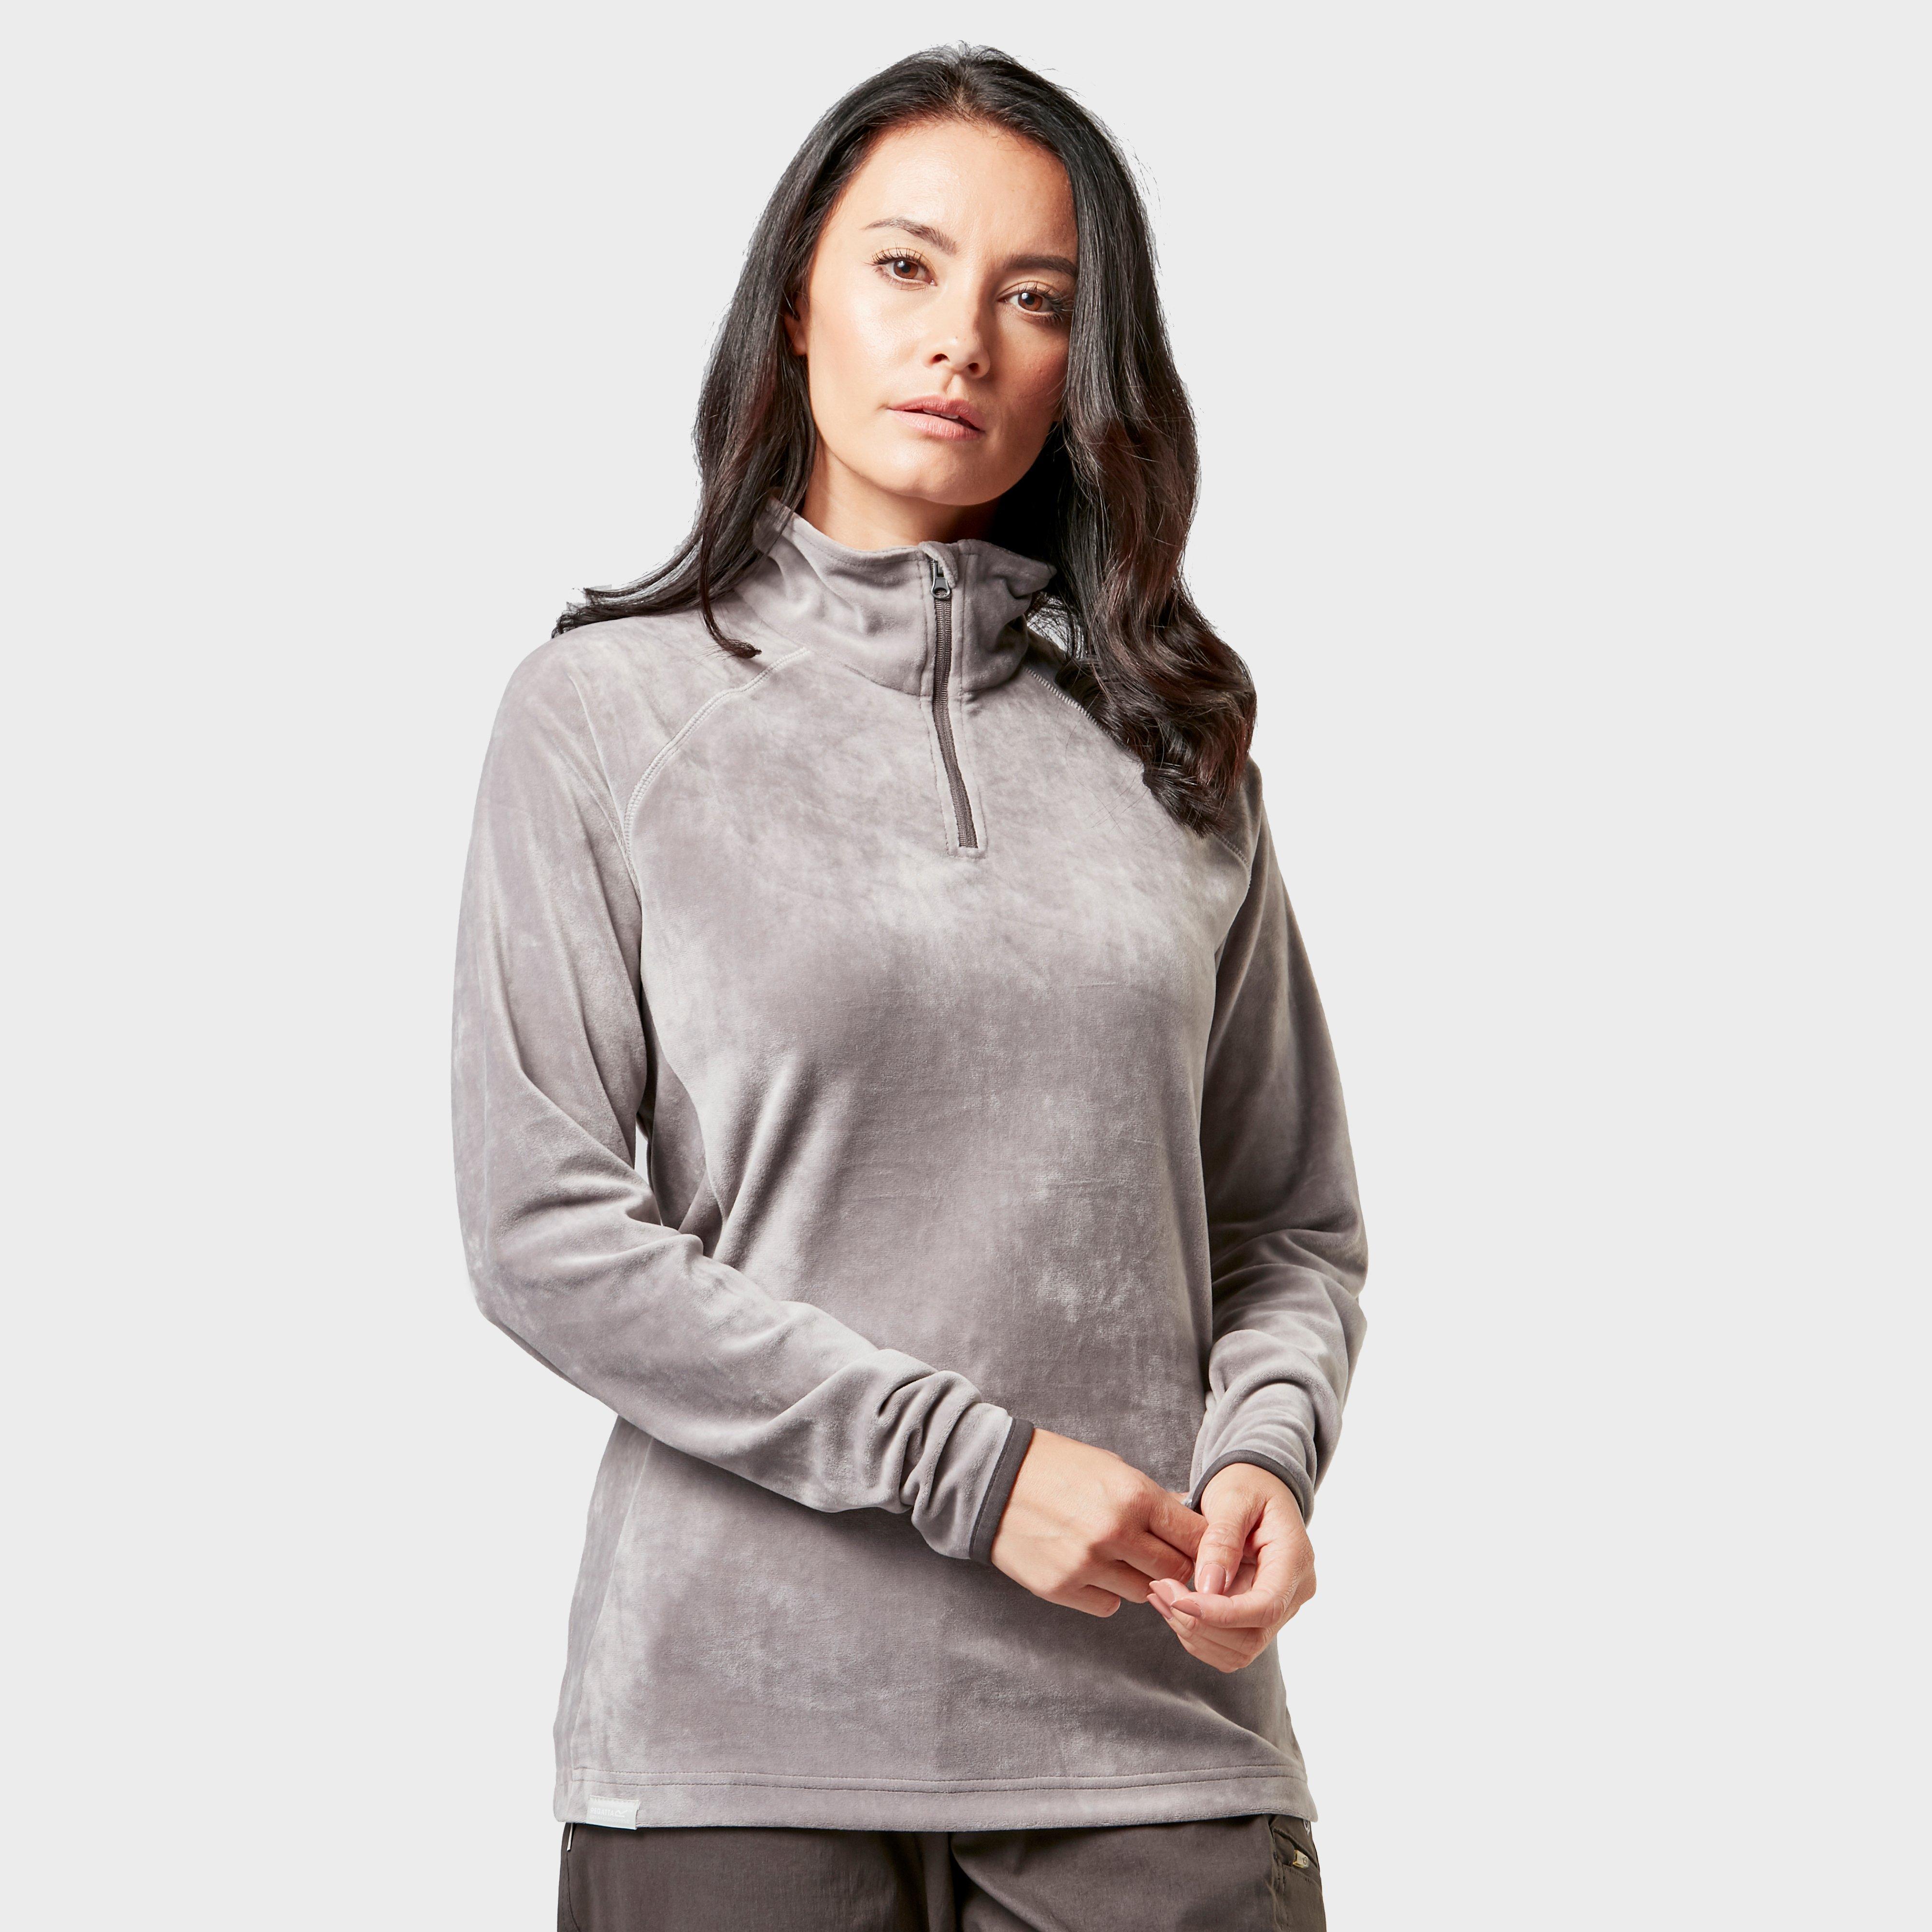 Regatta Regatta Womens Half-Zip Lavene Fleece - Grey, Grey